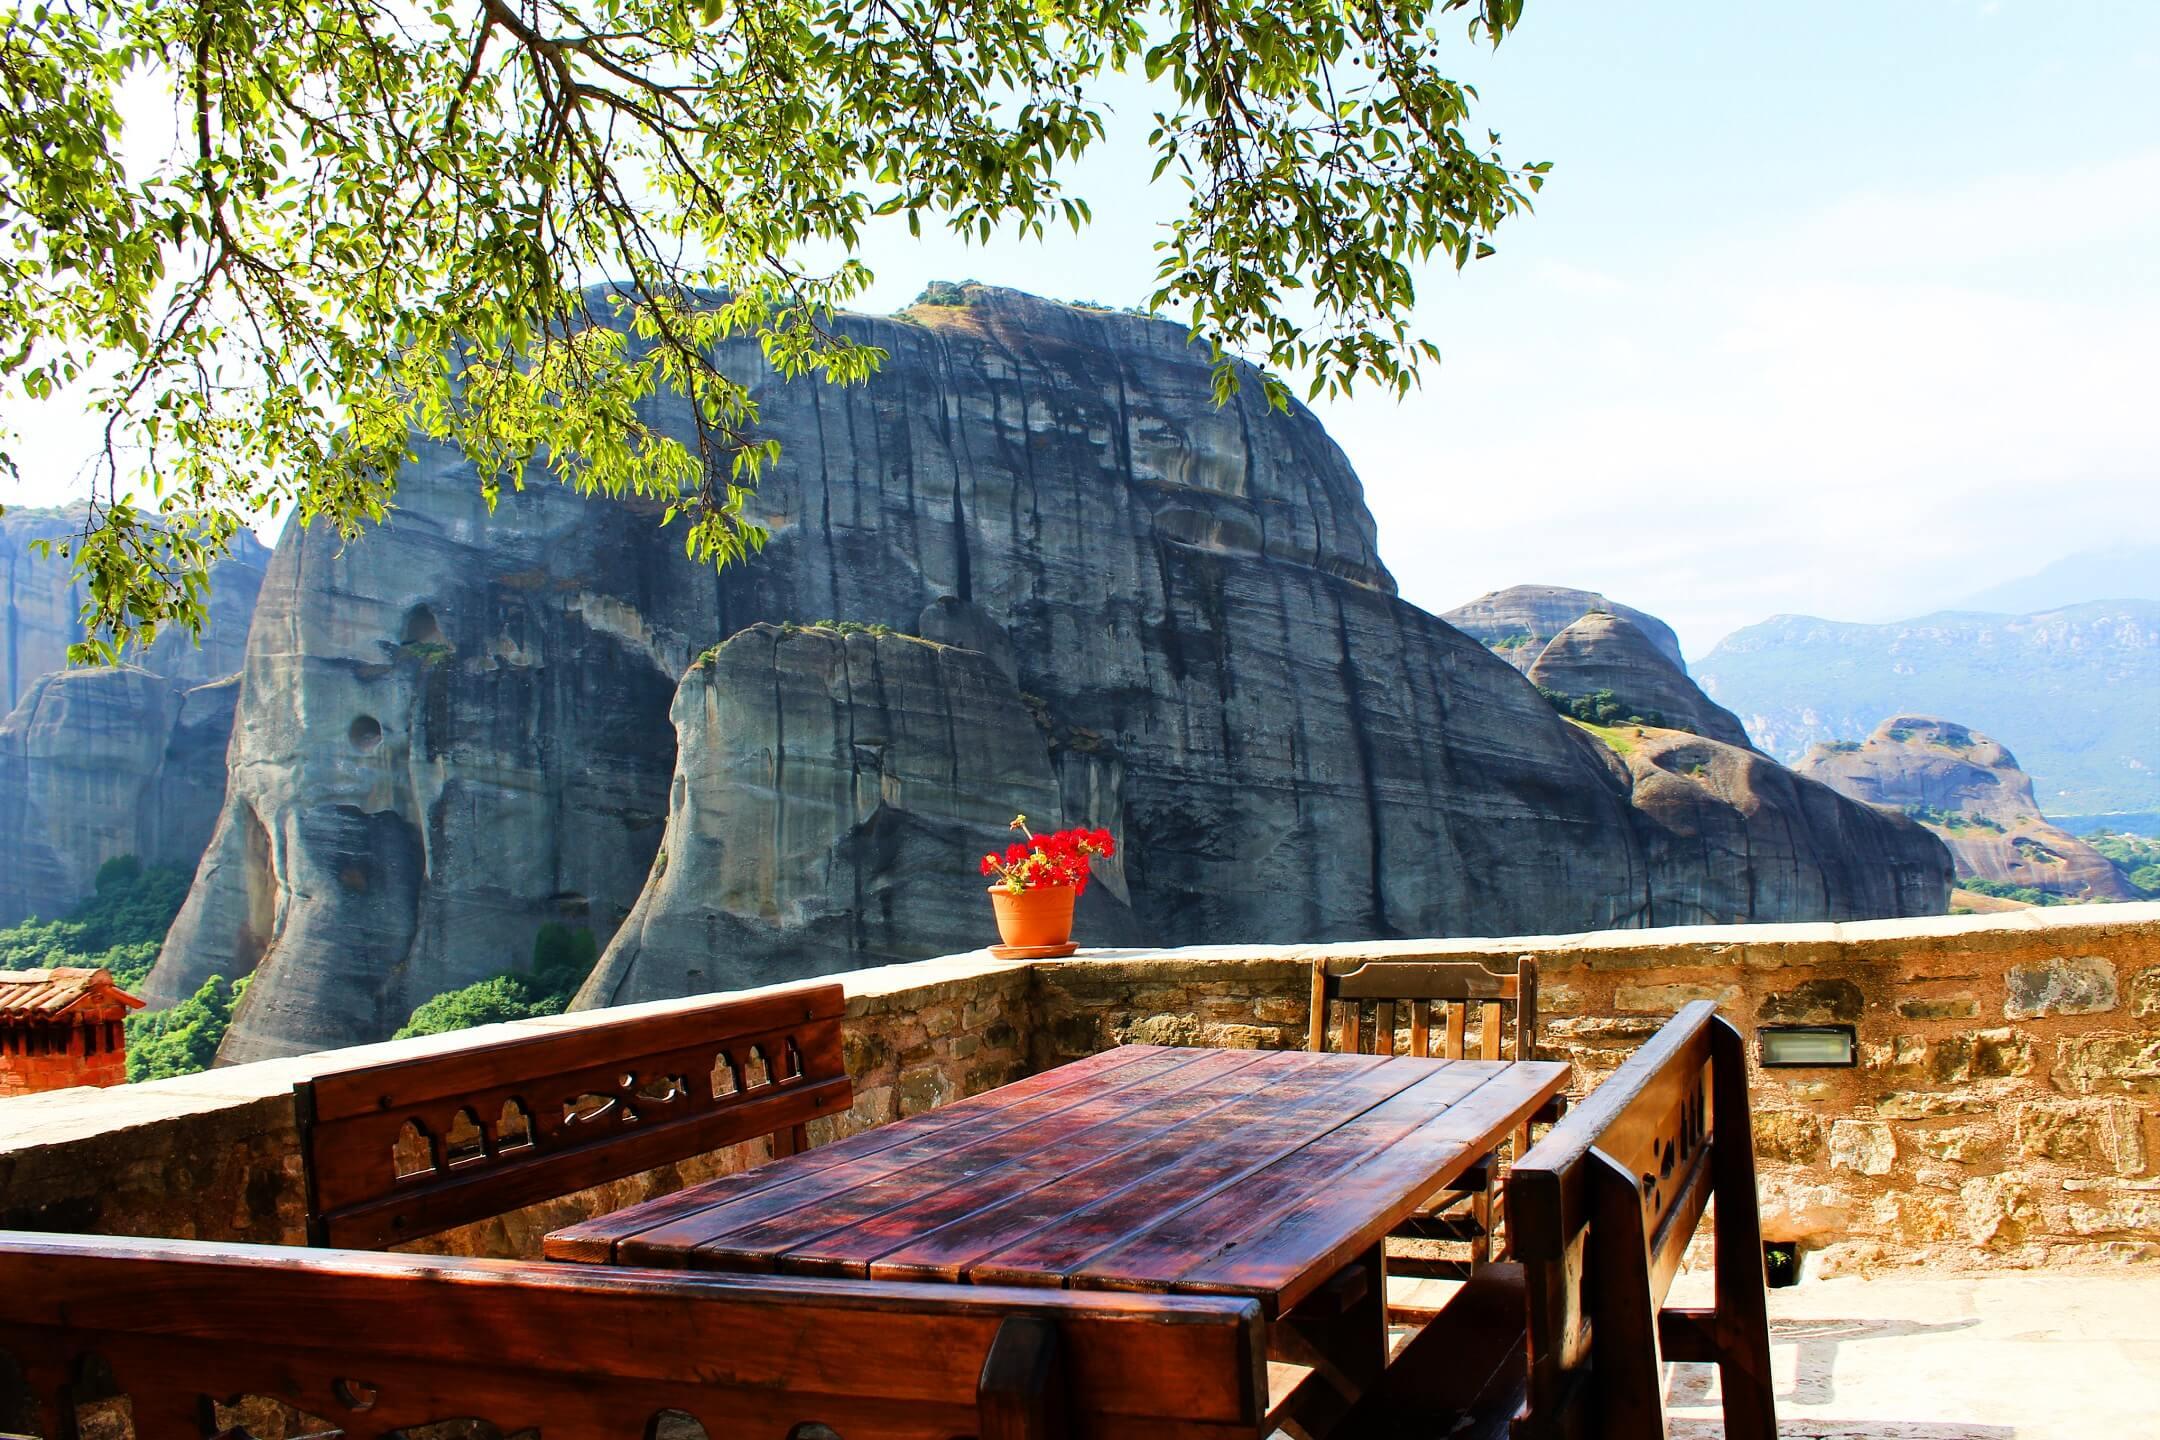 Kambaka by train - A hiking paradise in Greece